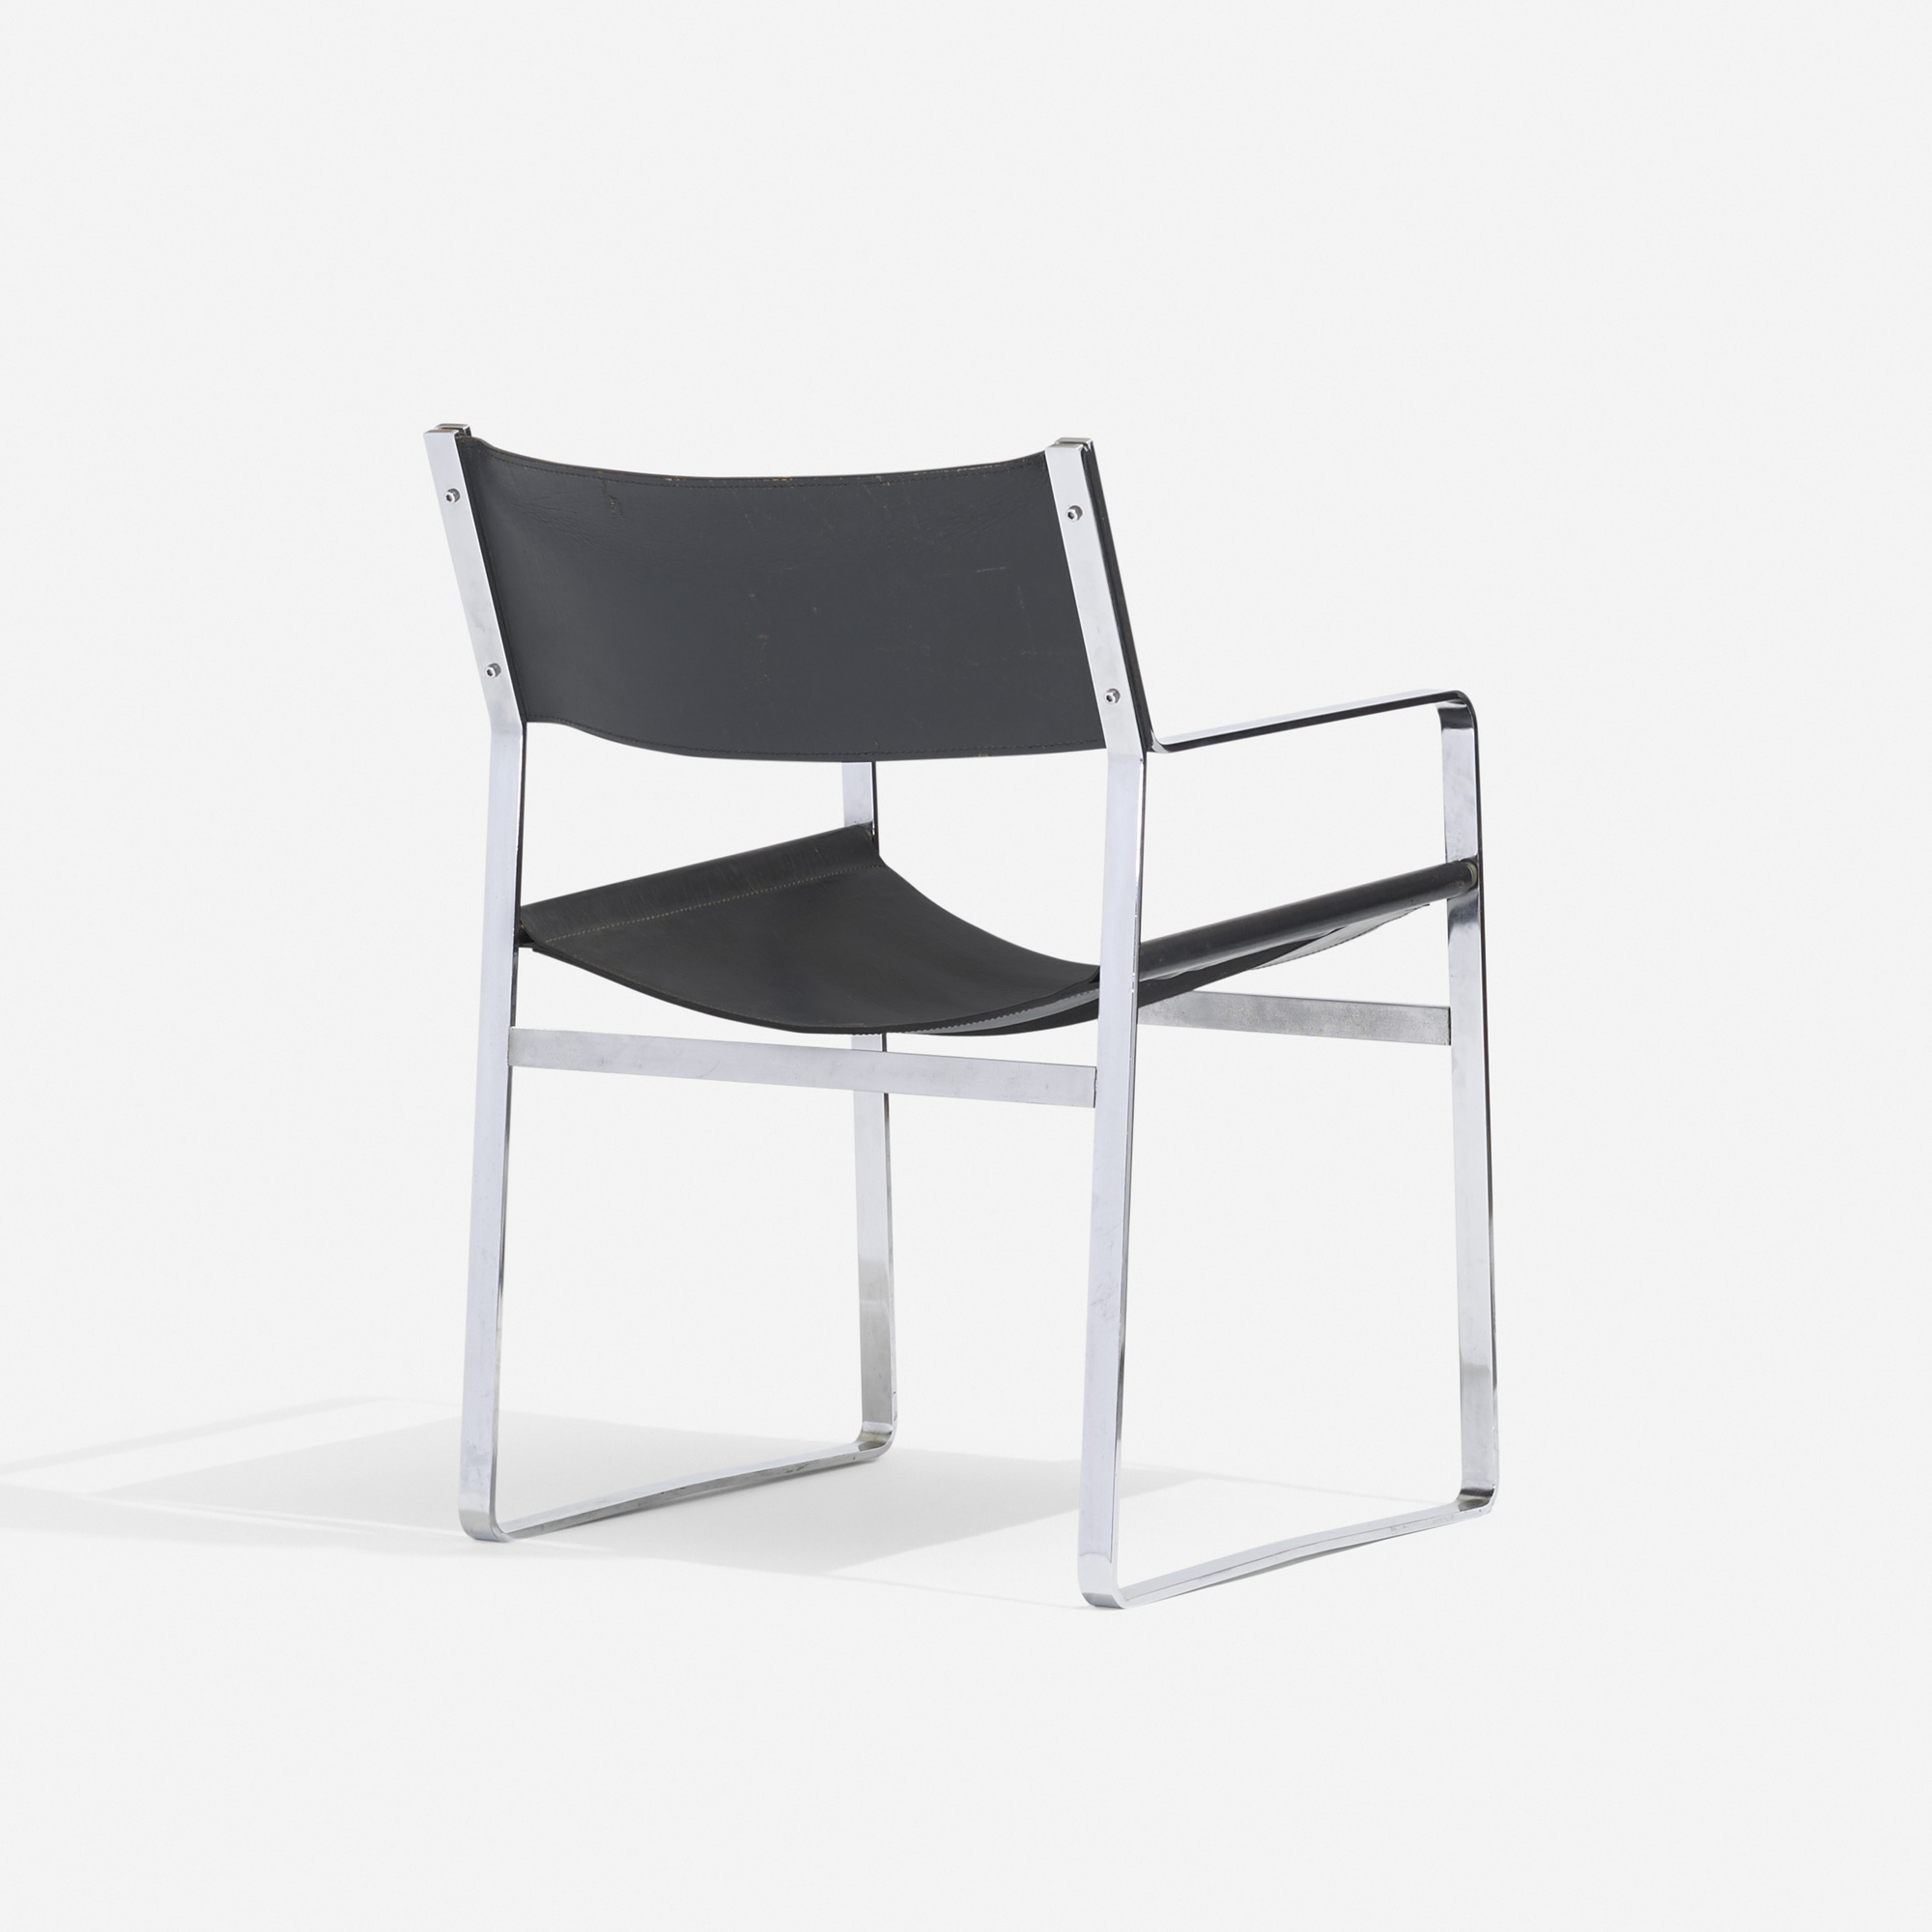 341: Hans J. Wegner / armchair, model JH812 (1 of 3)